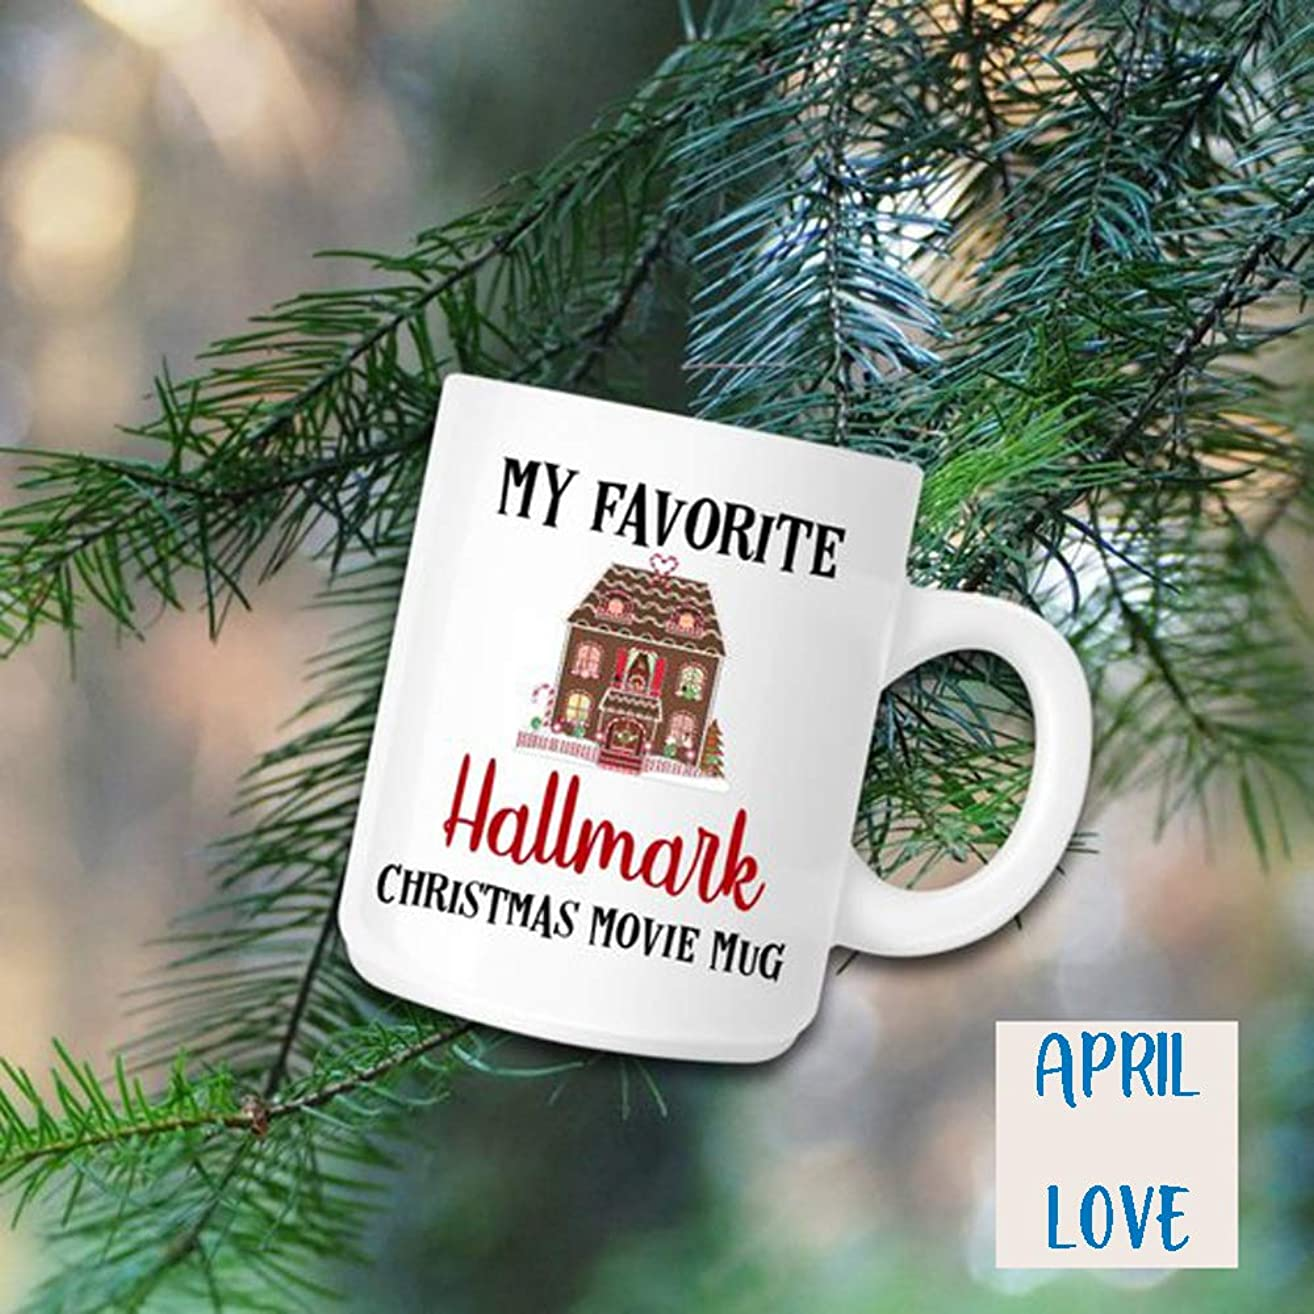 Best quality Hallmark Inspired Christmas Mug - Christmas Fave Movie Mug - Christmas Mug - Movie Watching Mug - Gift For Her - Best Friend Mug - Coffee